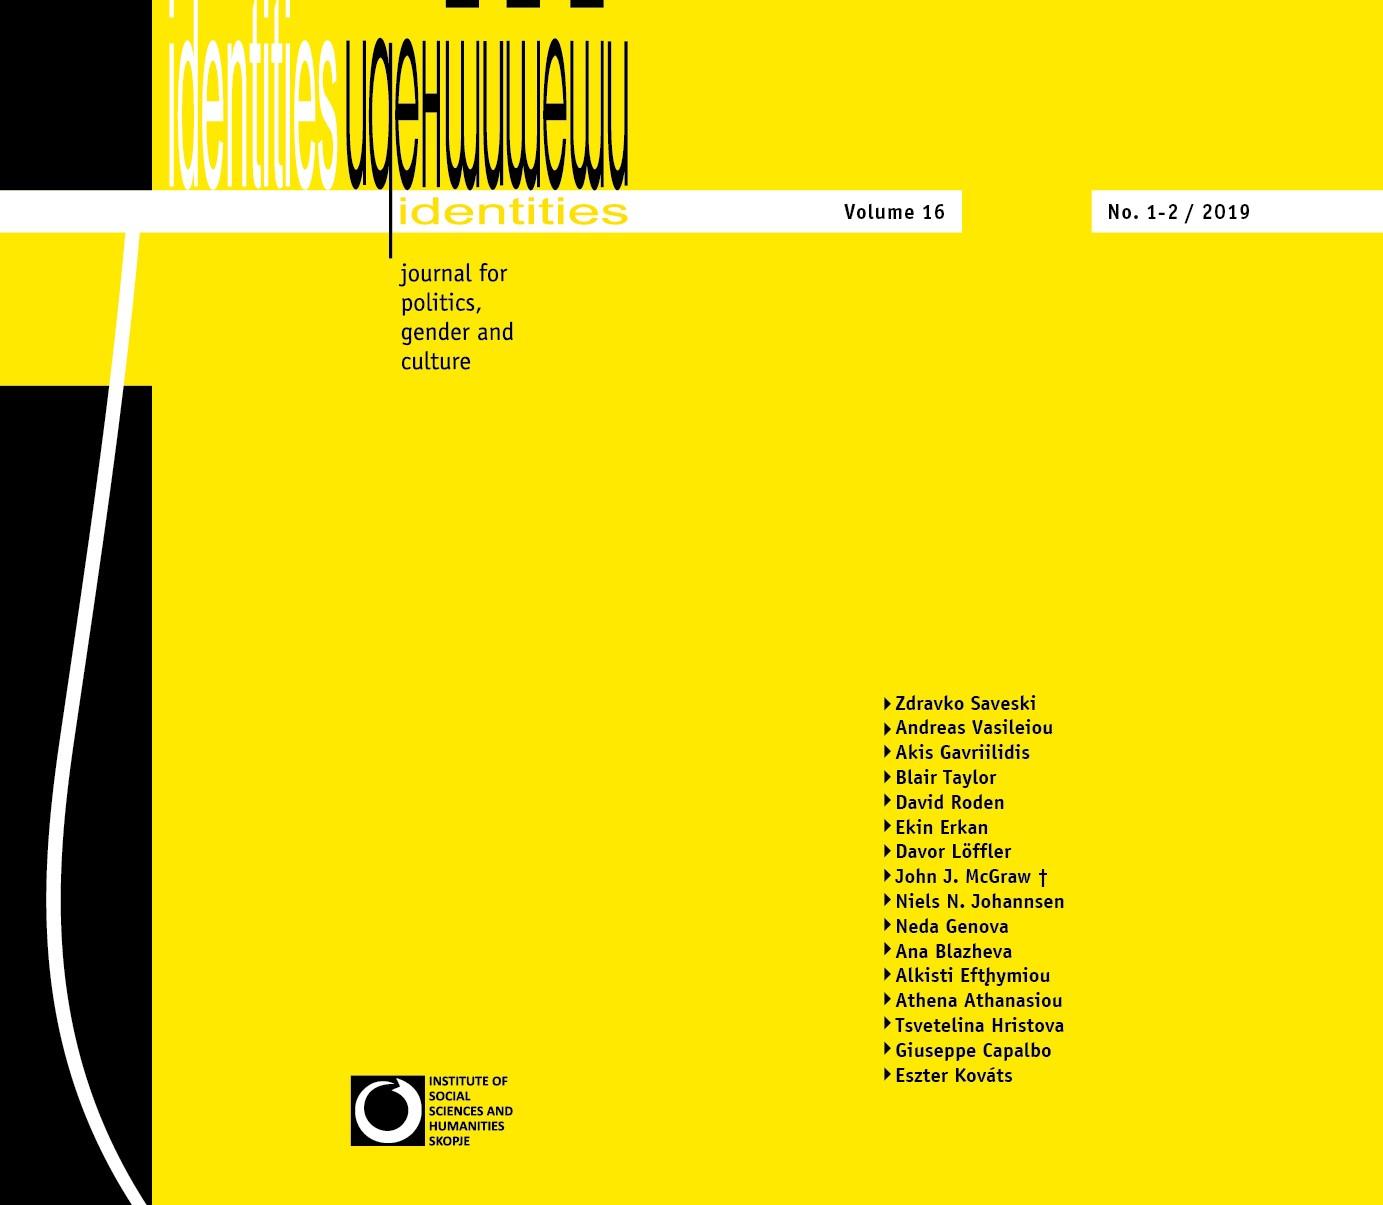 Vol. 16, No. 1-2 (Summer - Winter 2019) - Issue No. 30-31